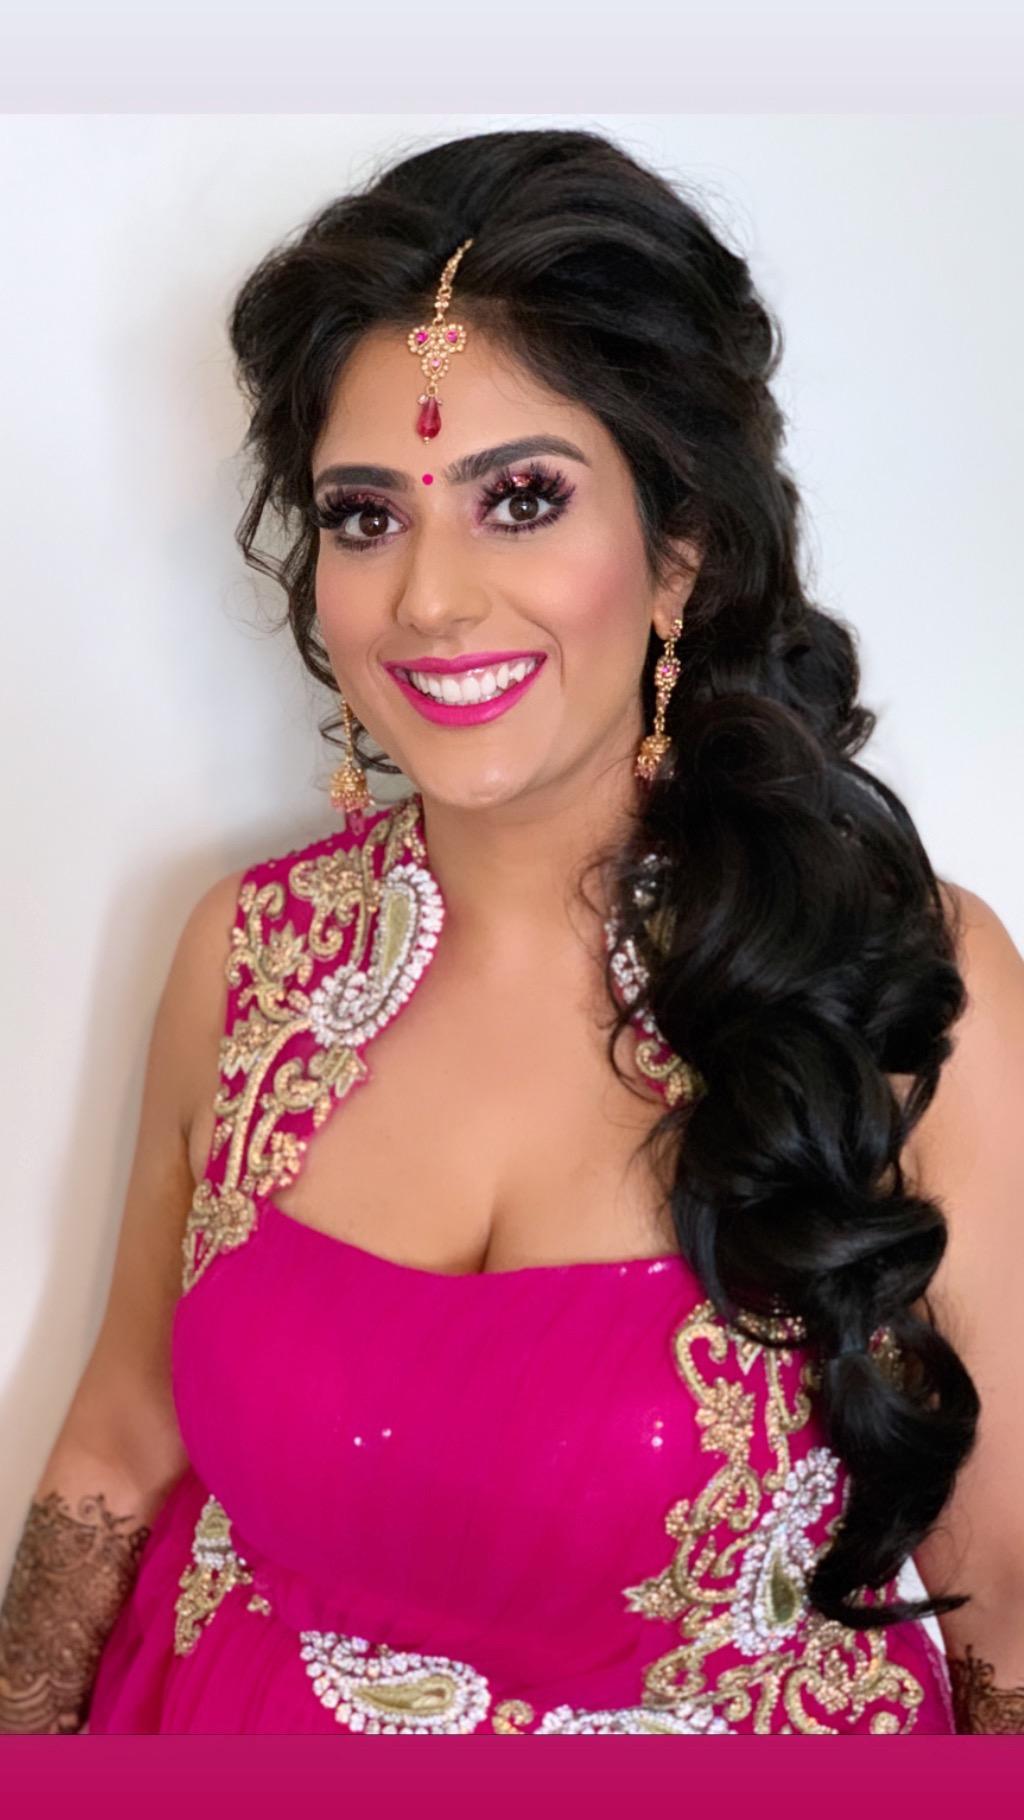 Mehndi bridal hair and makeup